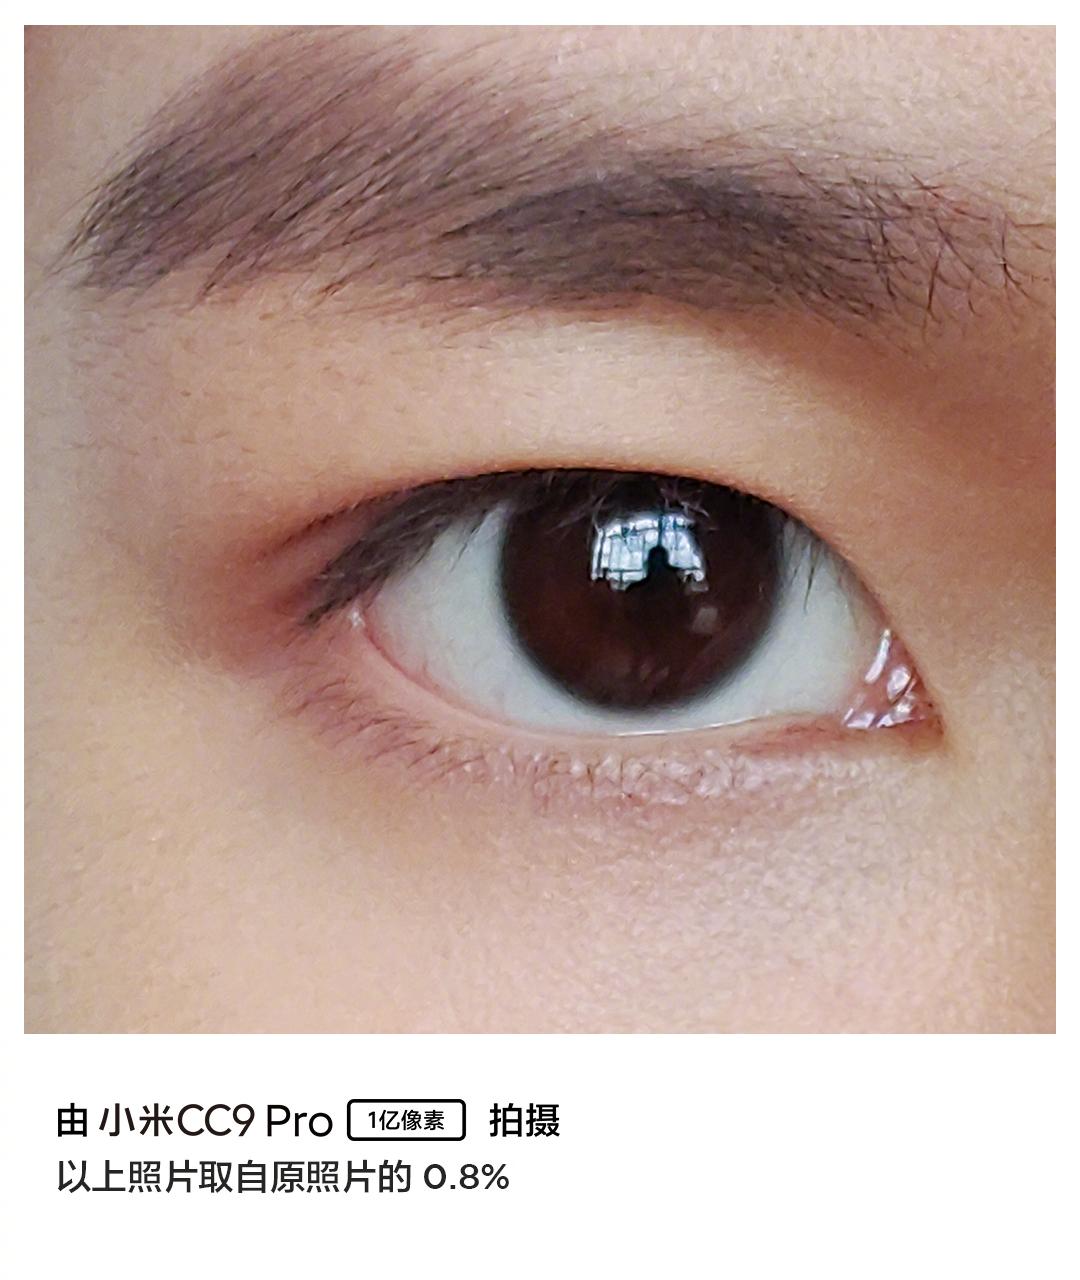 Sampel Kamera Mi CC9 Pro